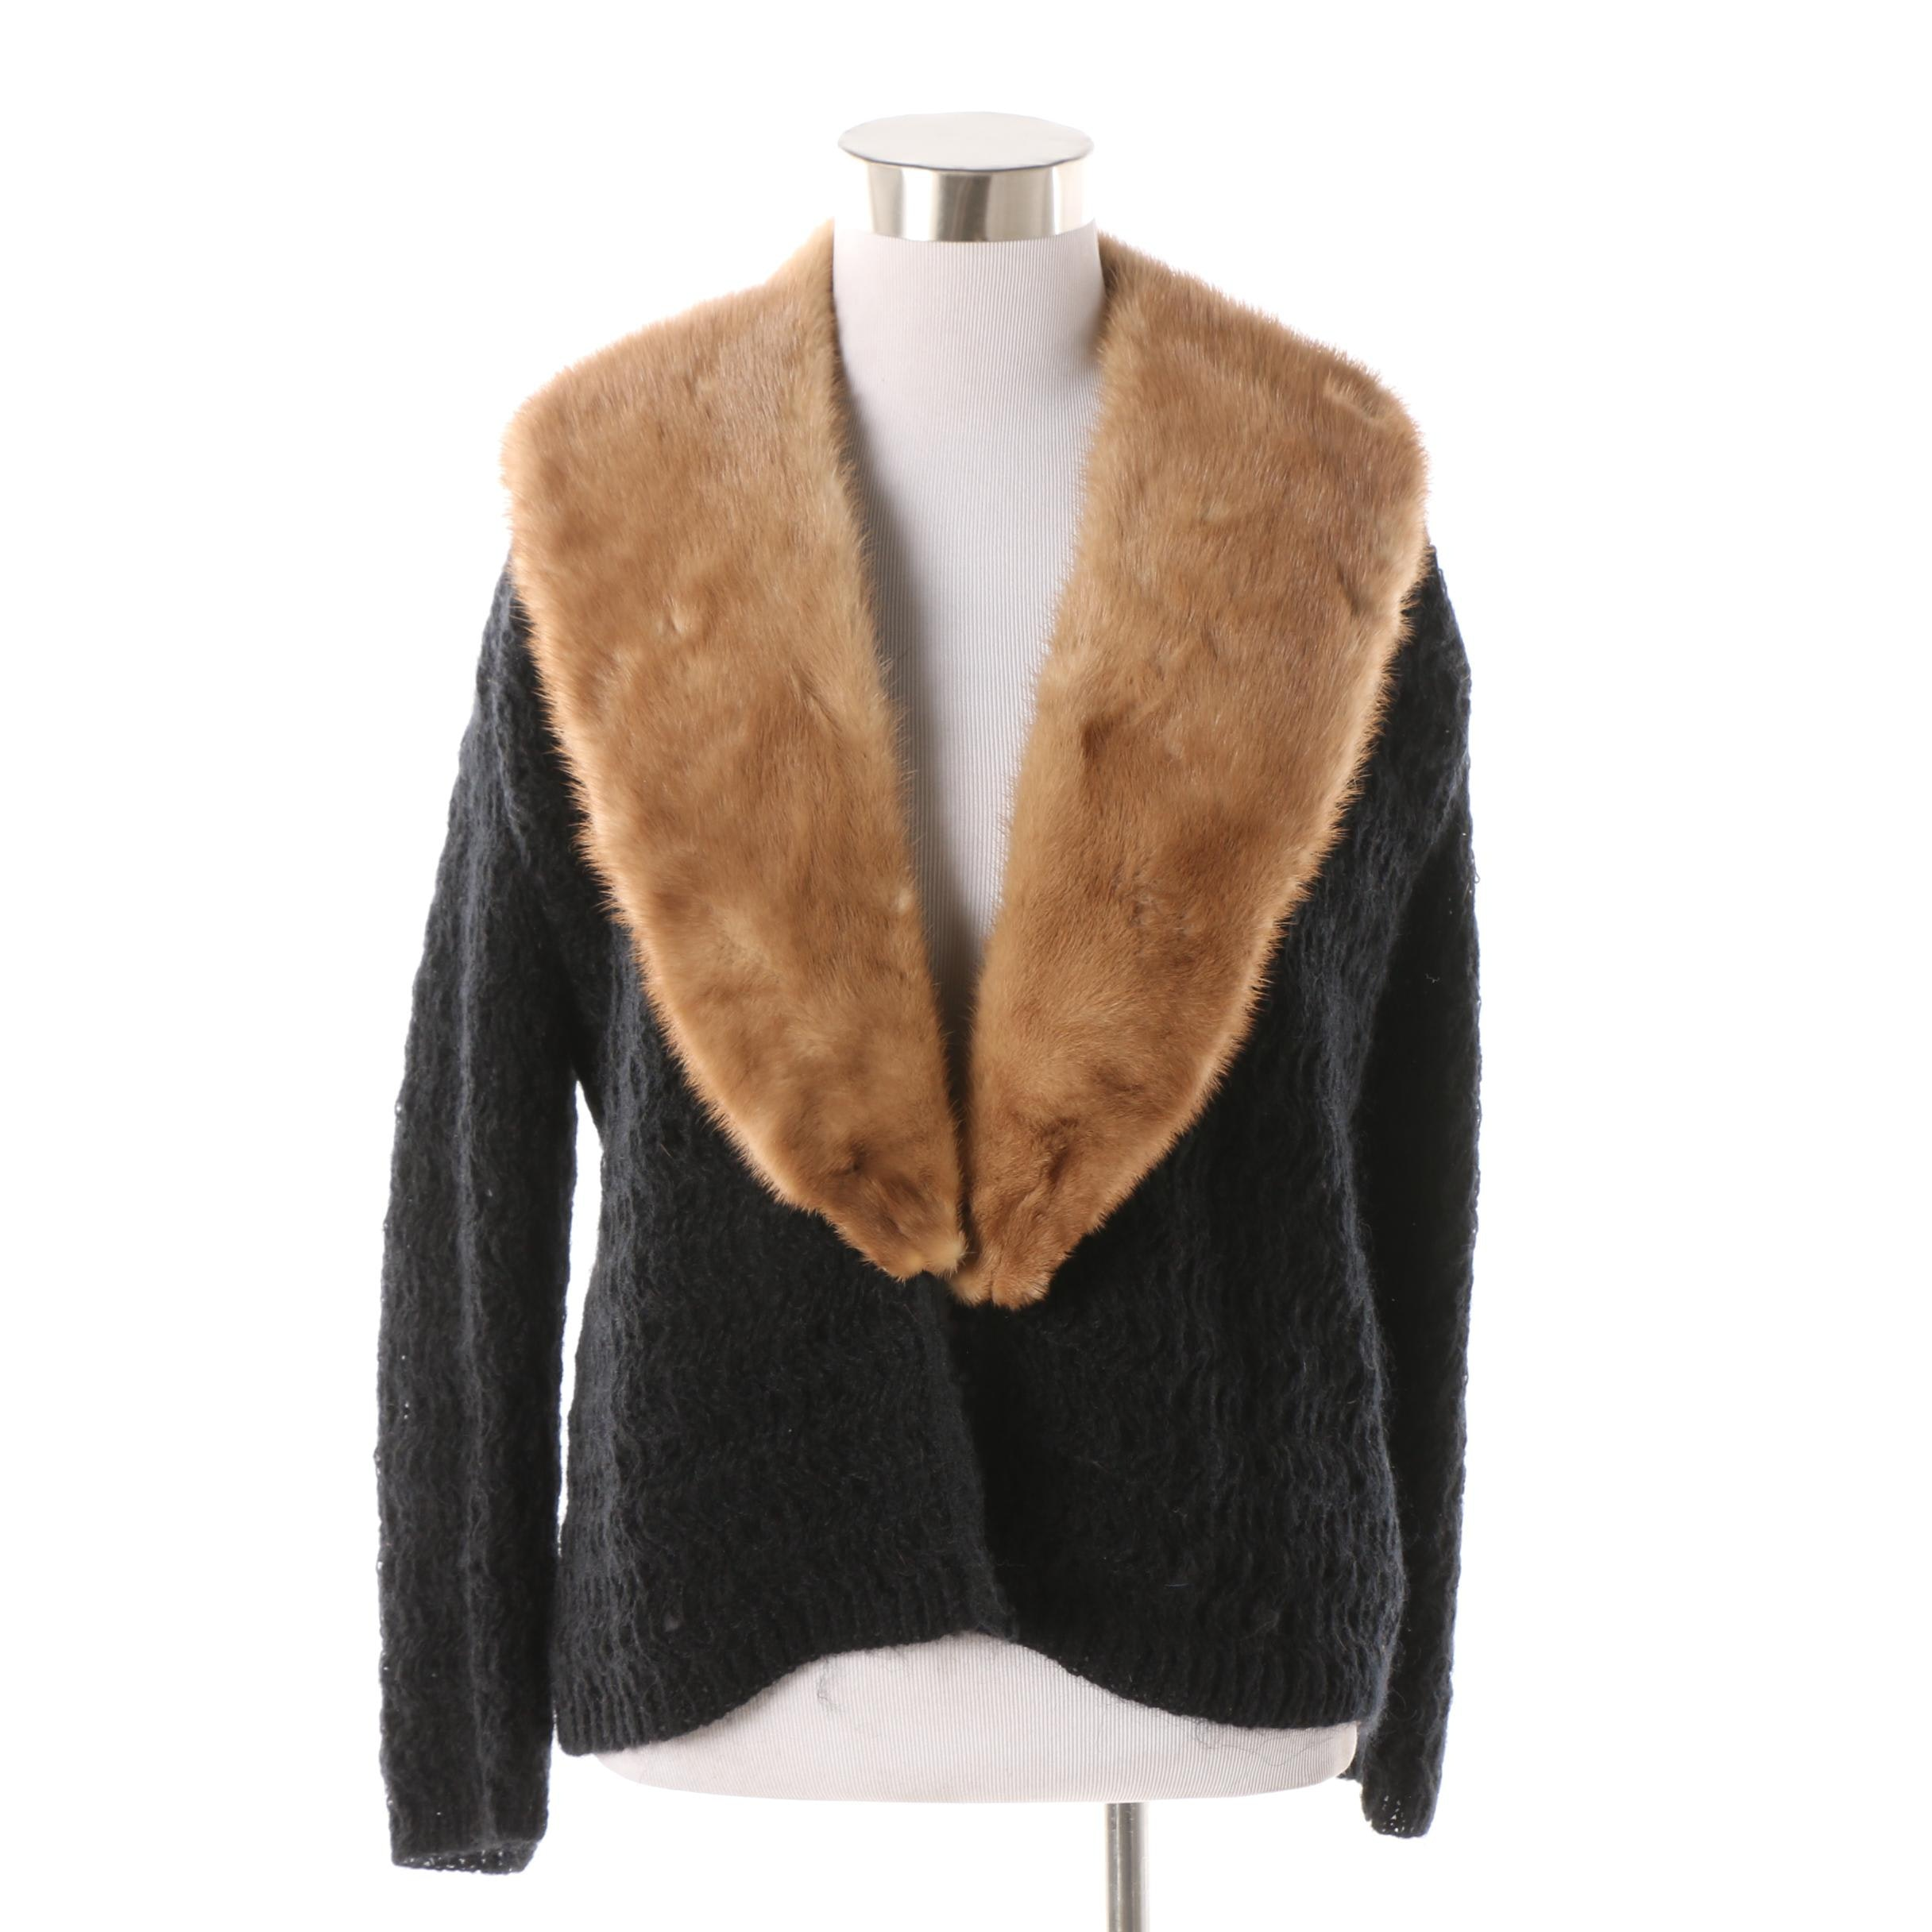 Vintage Sidney Gould Black Mohair Knit Cardigan with Mink Fur Collar